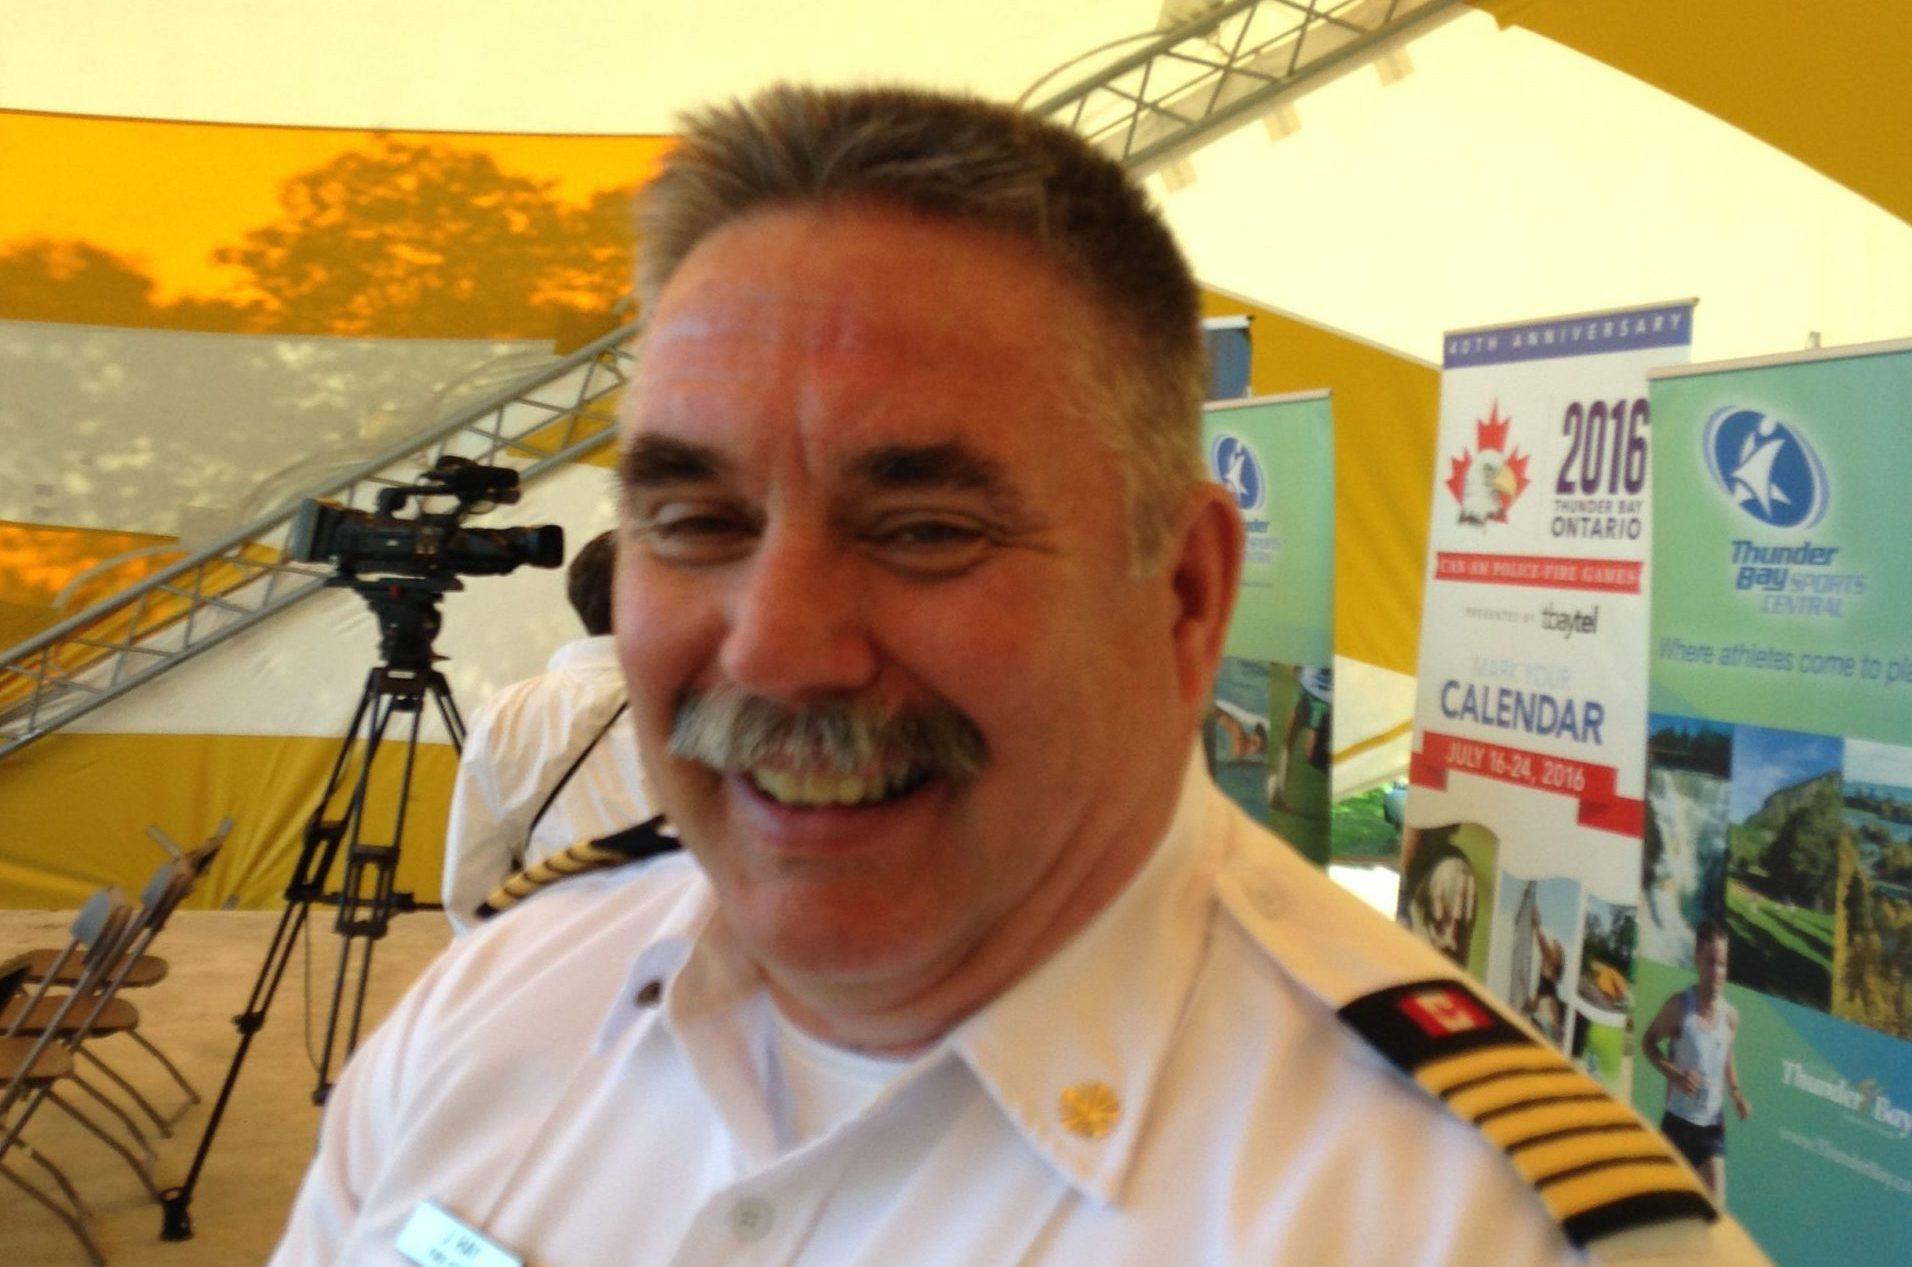 Firefighter Recruits Graduate